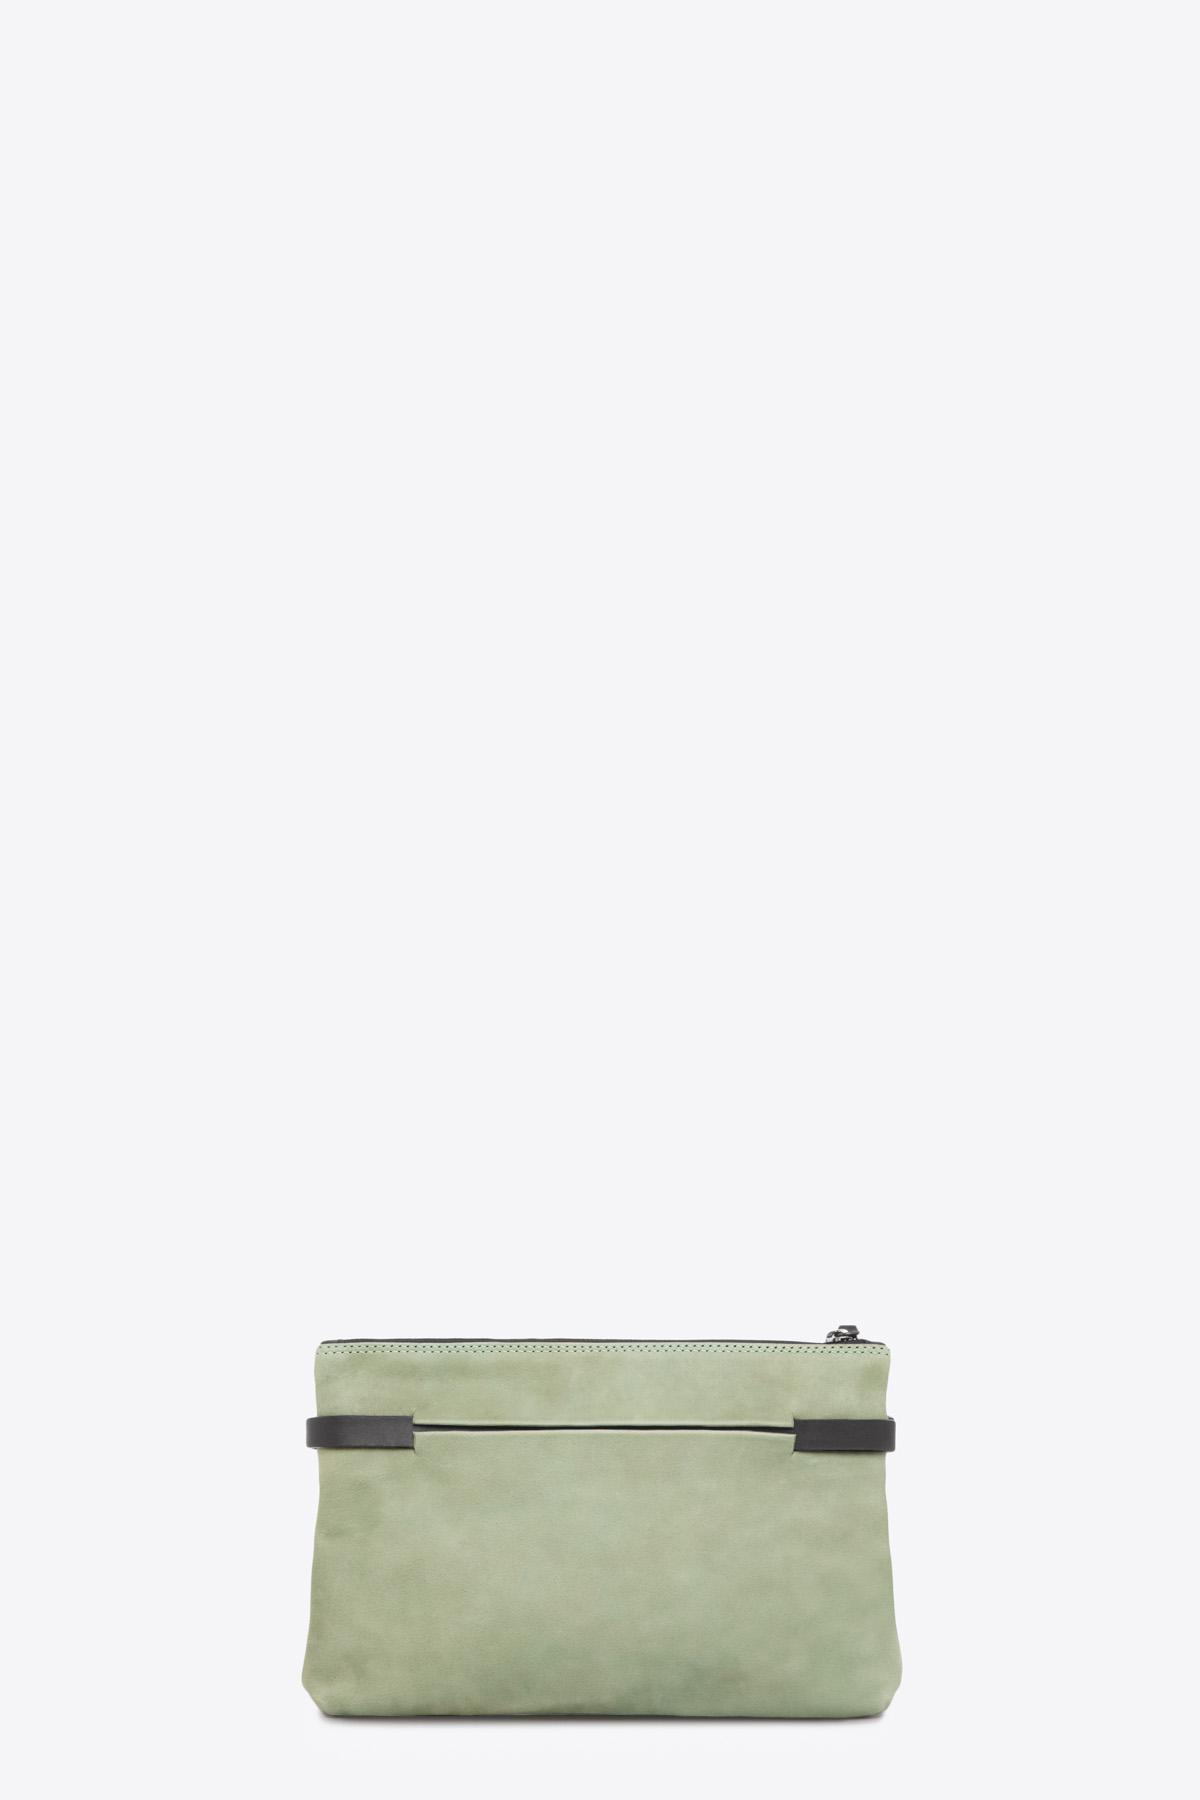 dclr004s-tapeclutch-a9-jadegreen-back